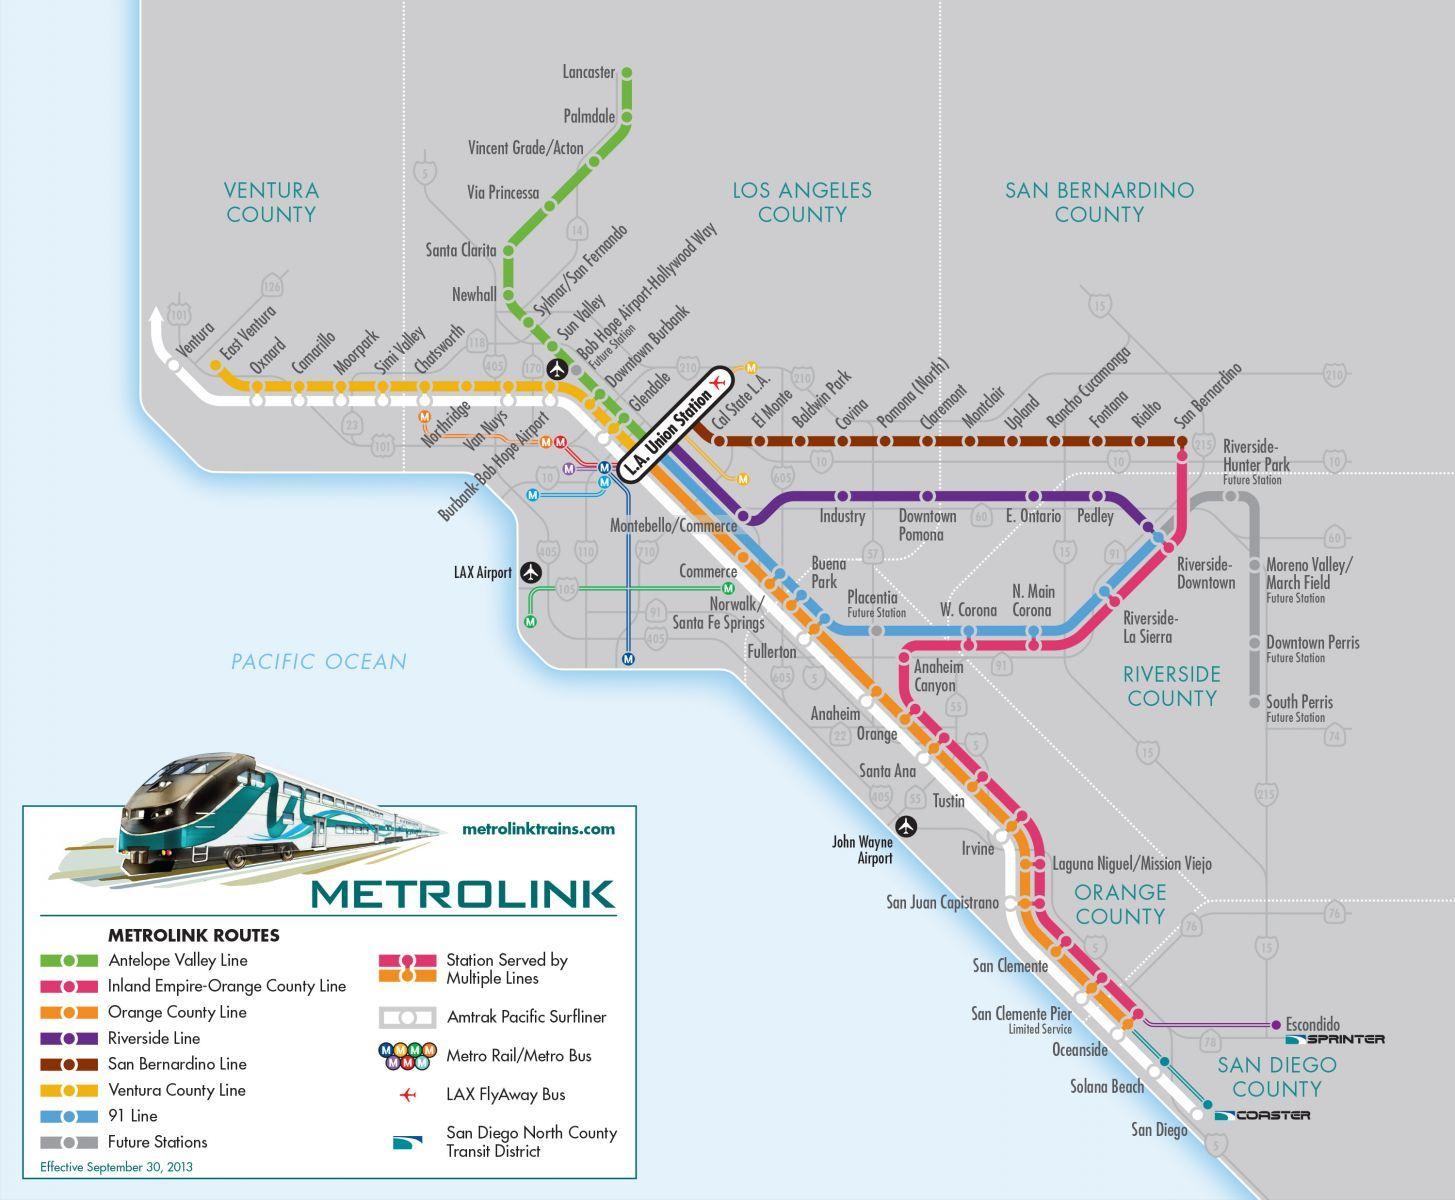 Metrolink Weekends Metrolink Travel tours, Day trips